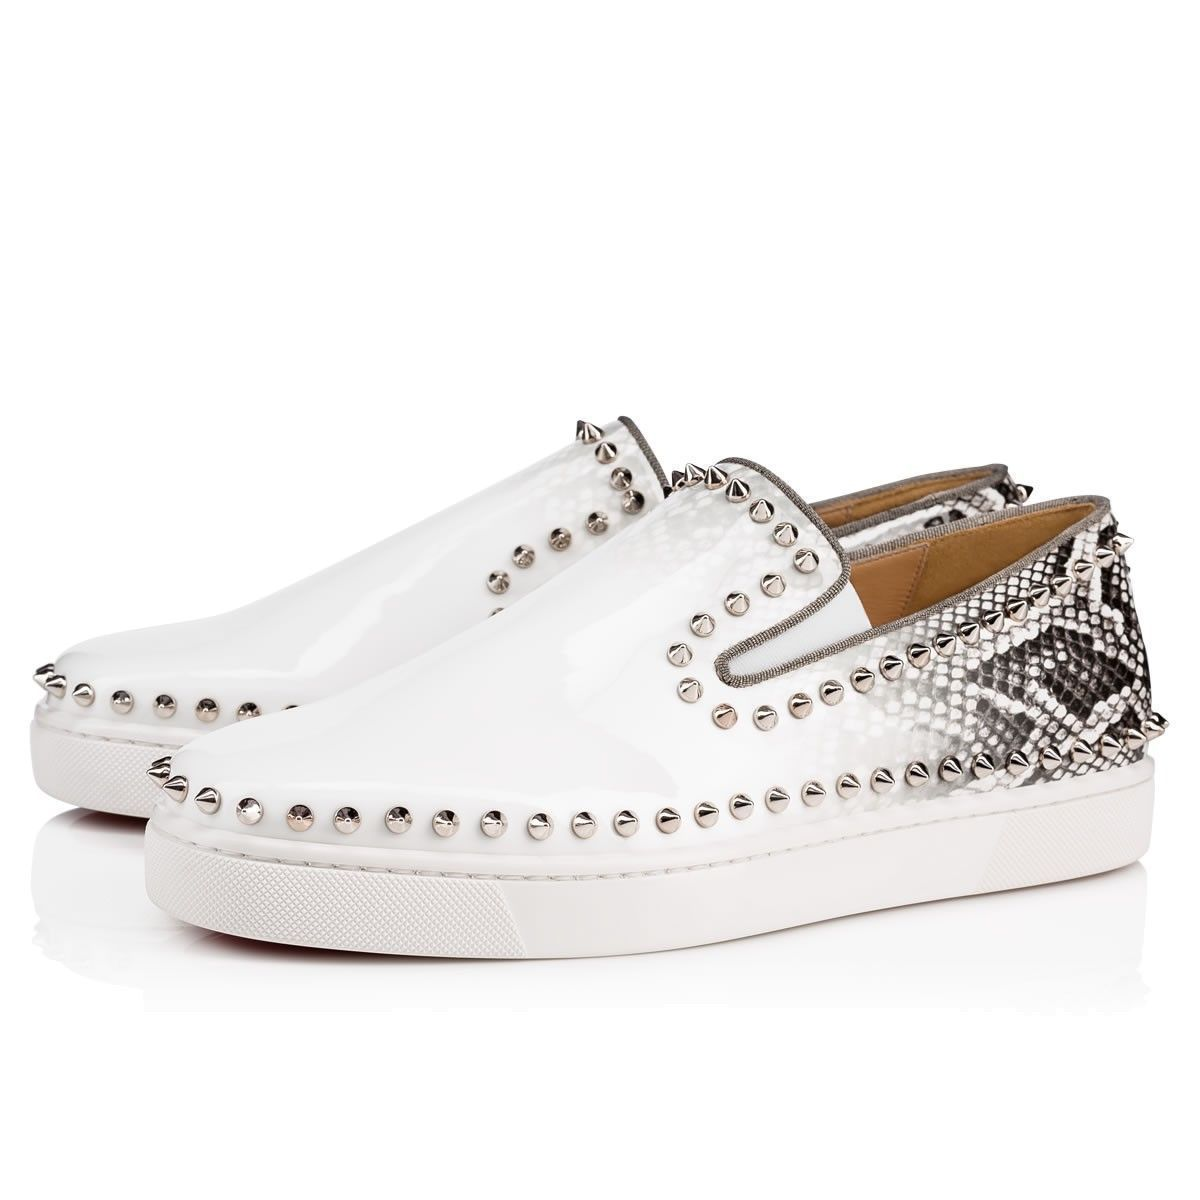 c06c3928f14 Pik Boat Men s Flat White-Roccia Silver Patent - Men Shoes - Christian  Louboutin